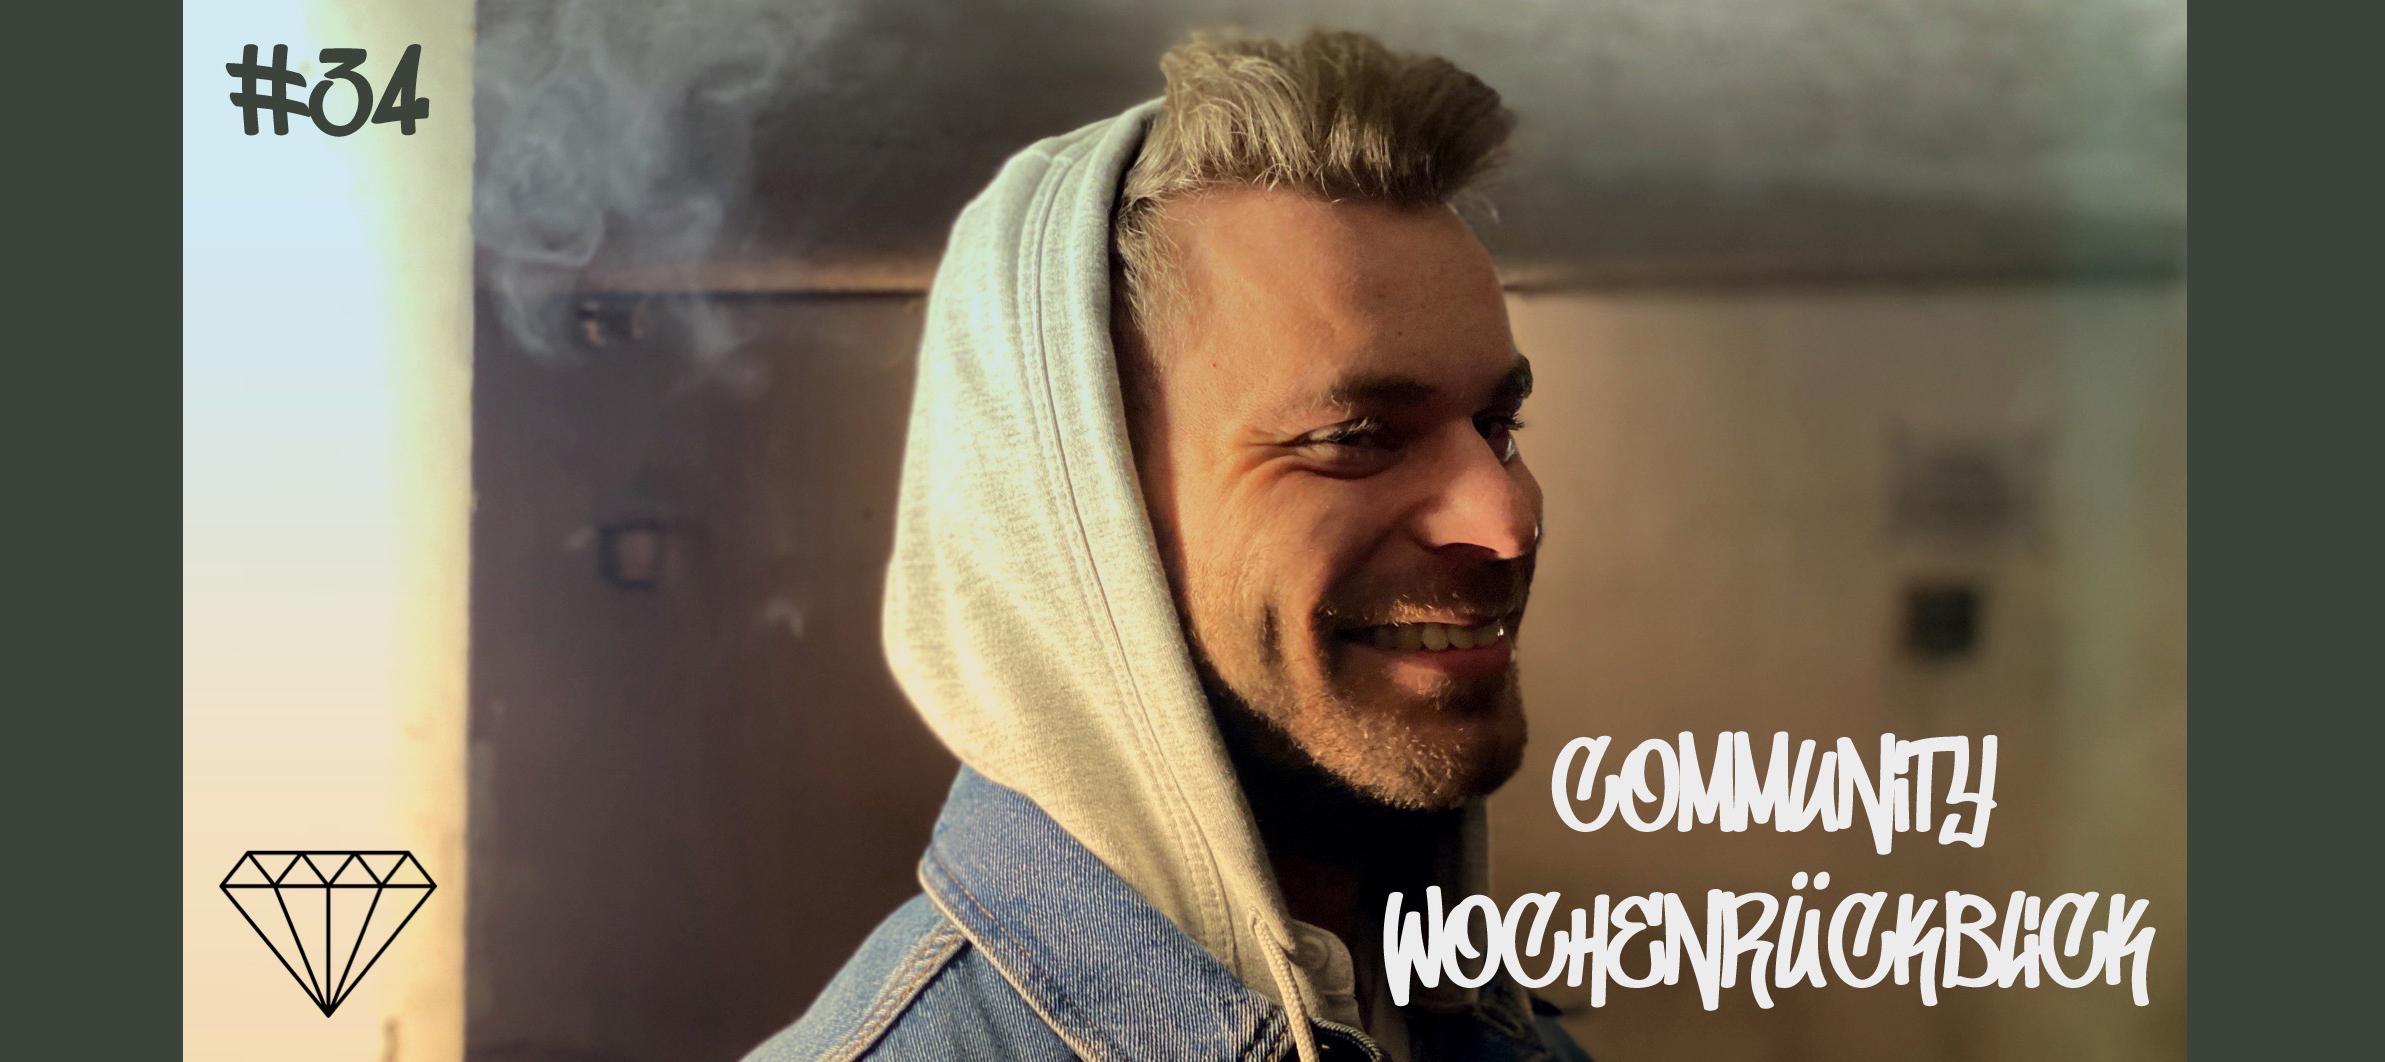 Community Wochenrückblick #34